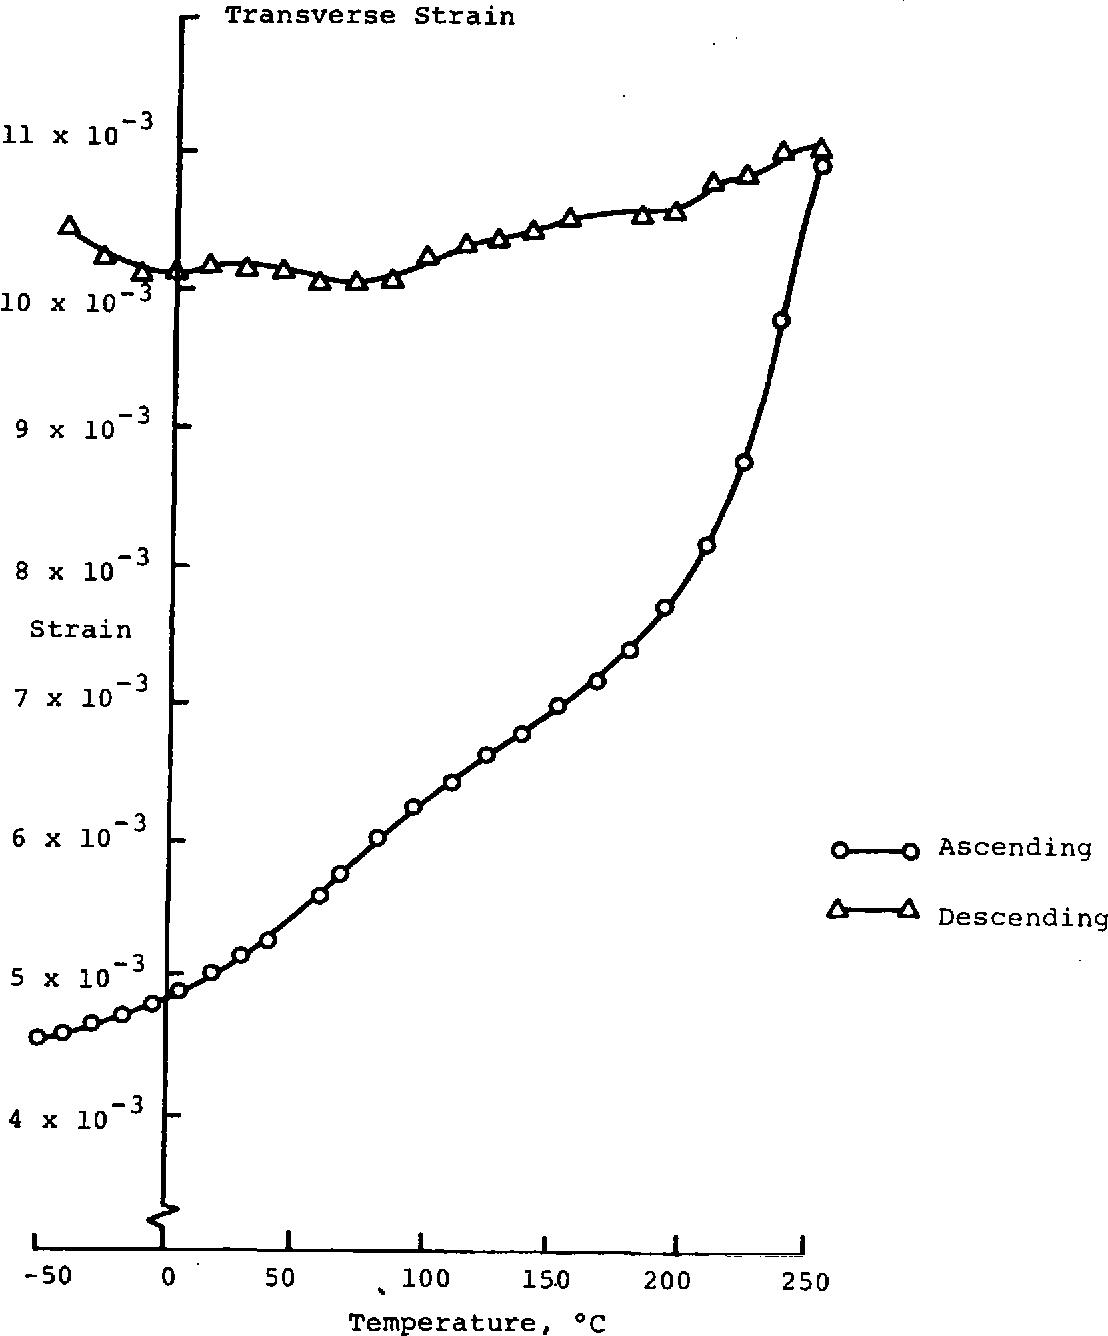 Figure 8. Transverse Strain versus Temperature Load = -2946 N (-300 kg) Ooll = -70.74 MPa